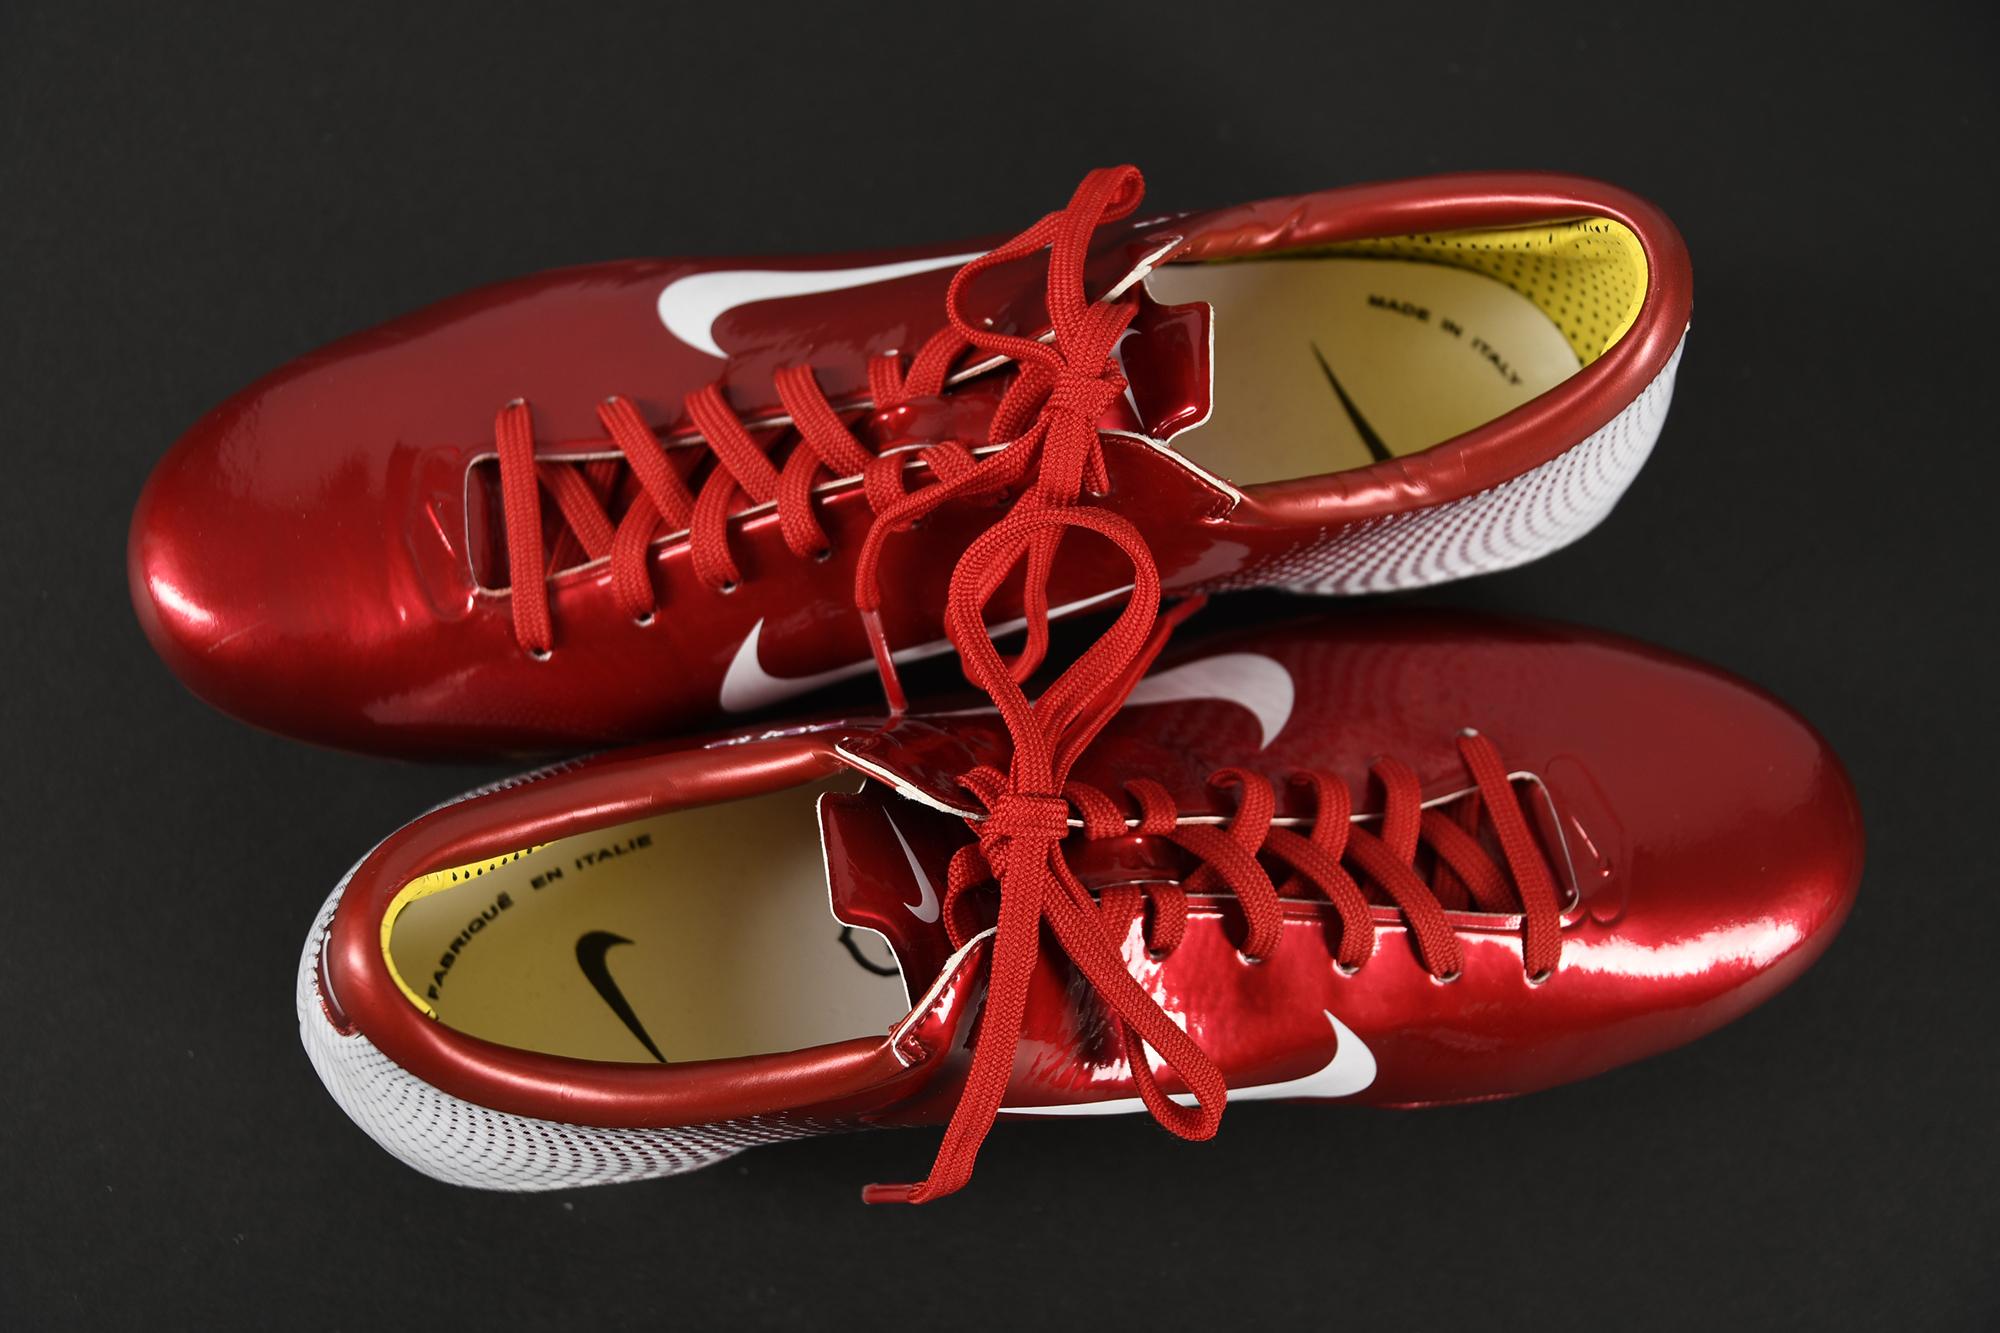 LOUIS SAHA Personalised Football Boots - Image 2 of 5